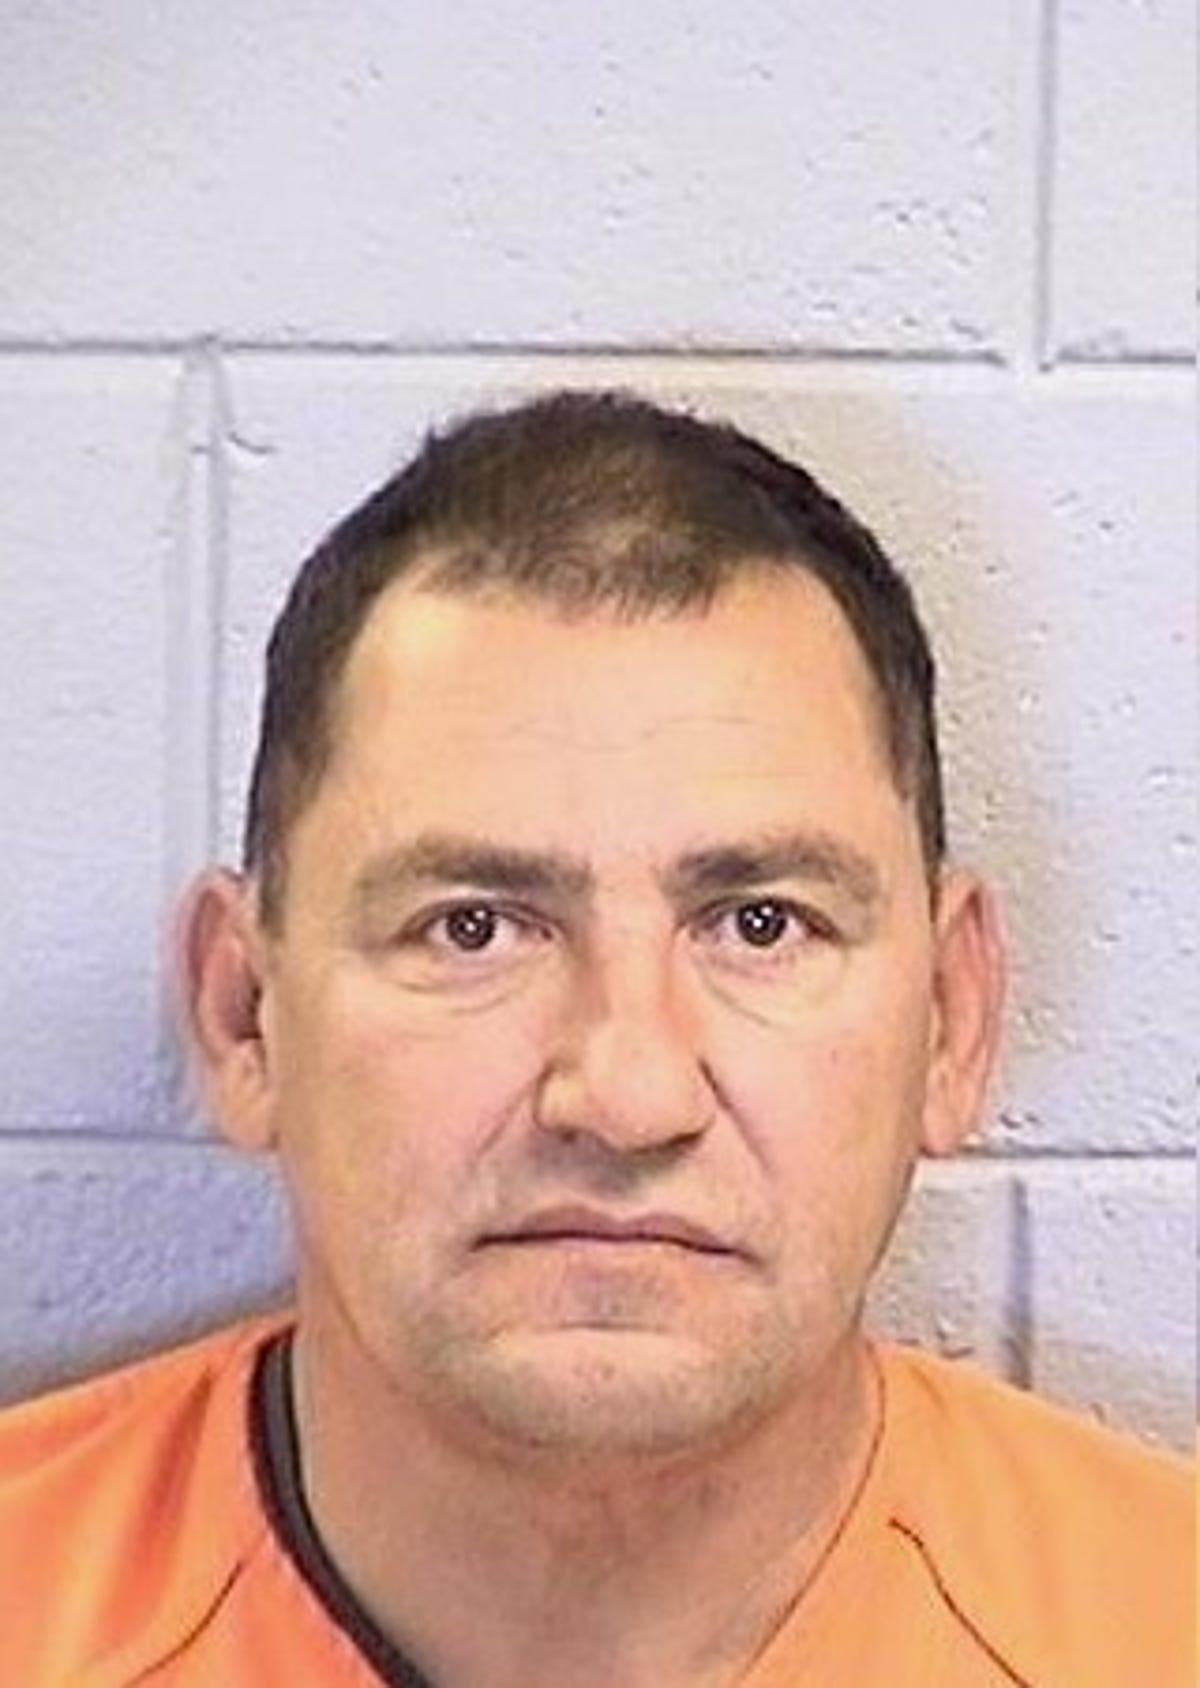 Man accused of stealing bulldozer in Farmington